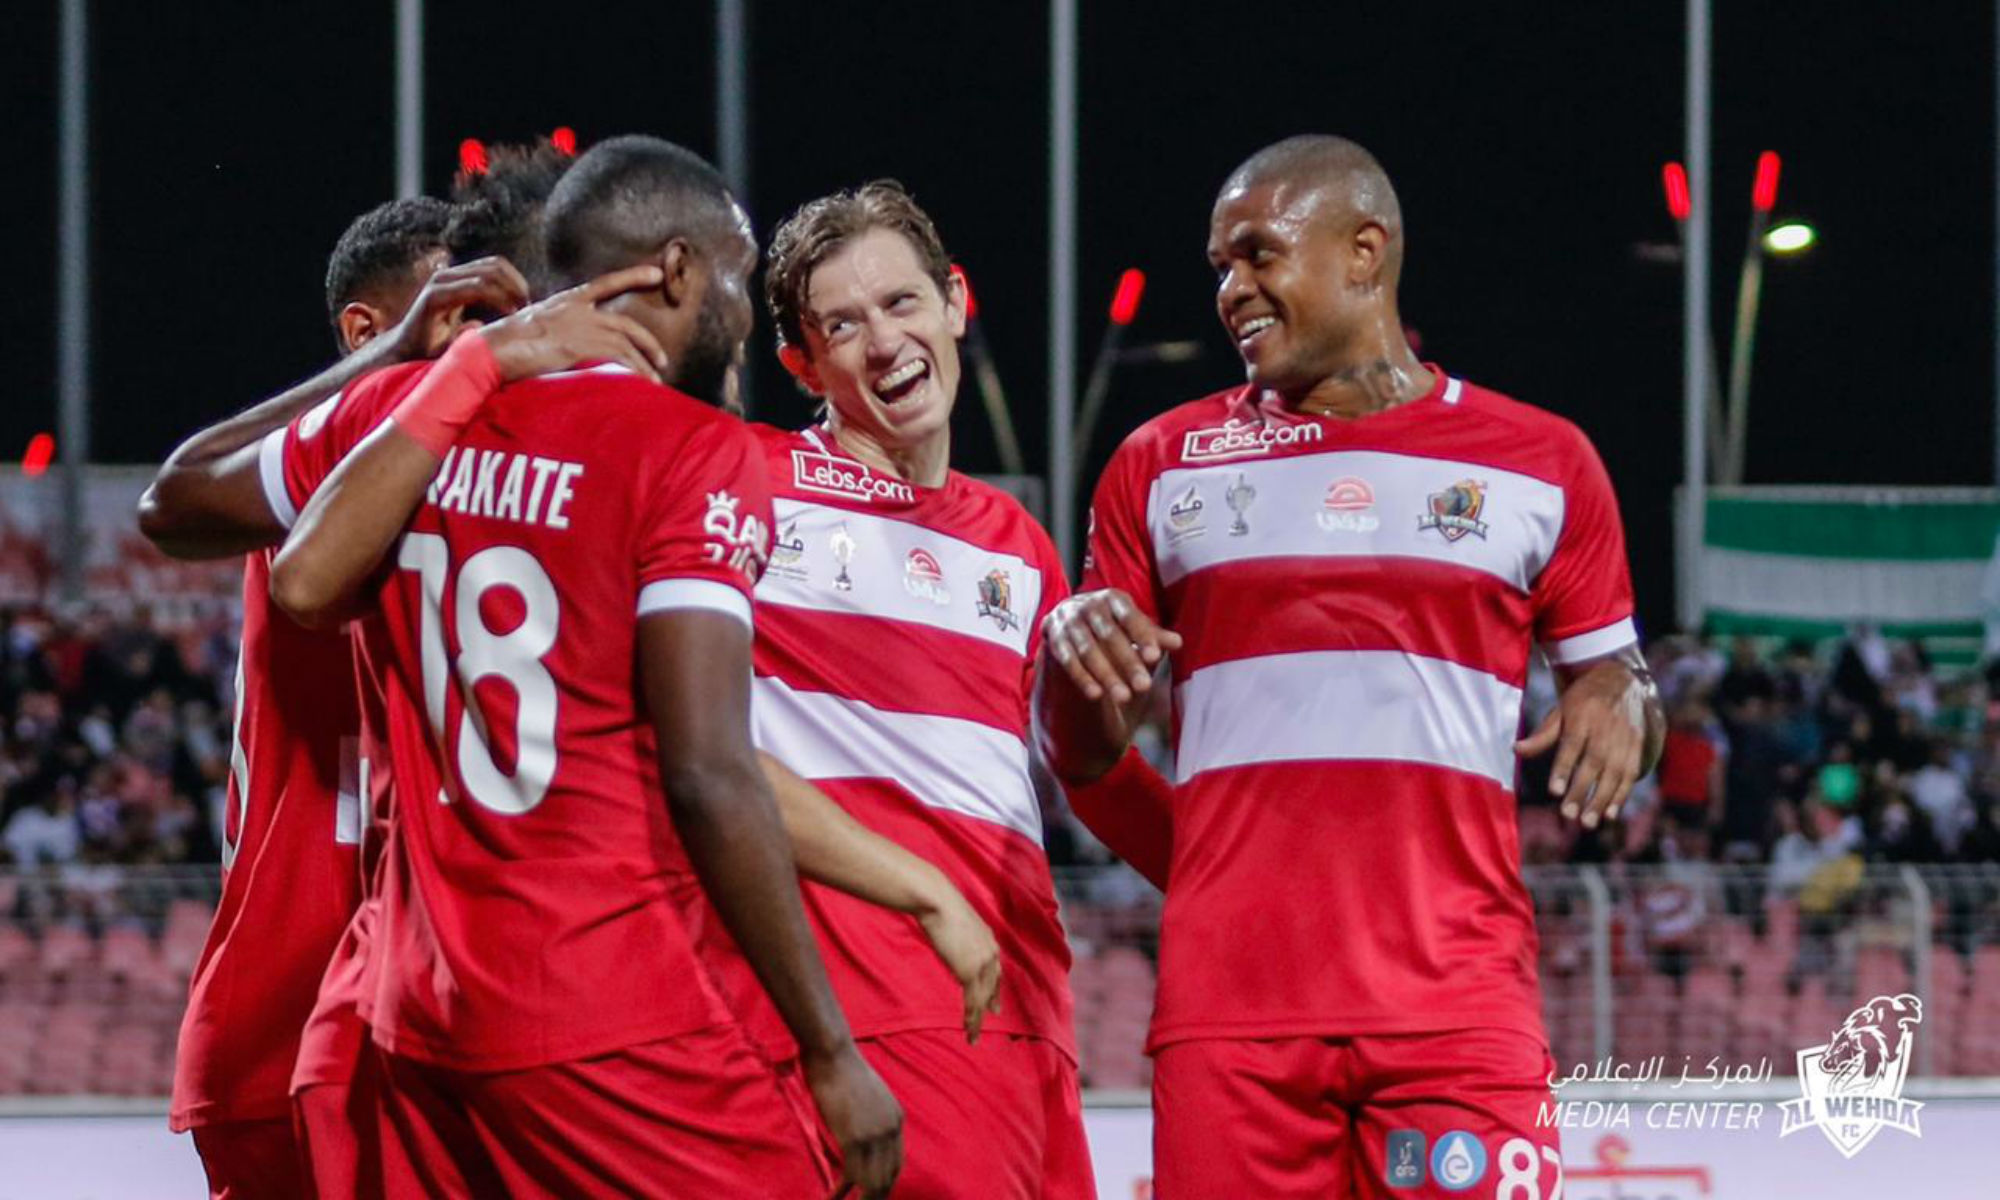 Aussies Abroad: Goodwin assists Al-Wehda win, Irvine in Championship classic